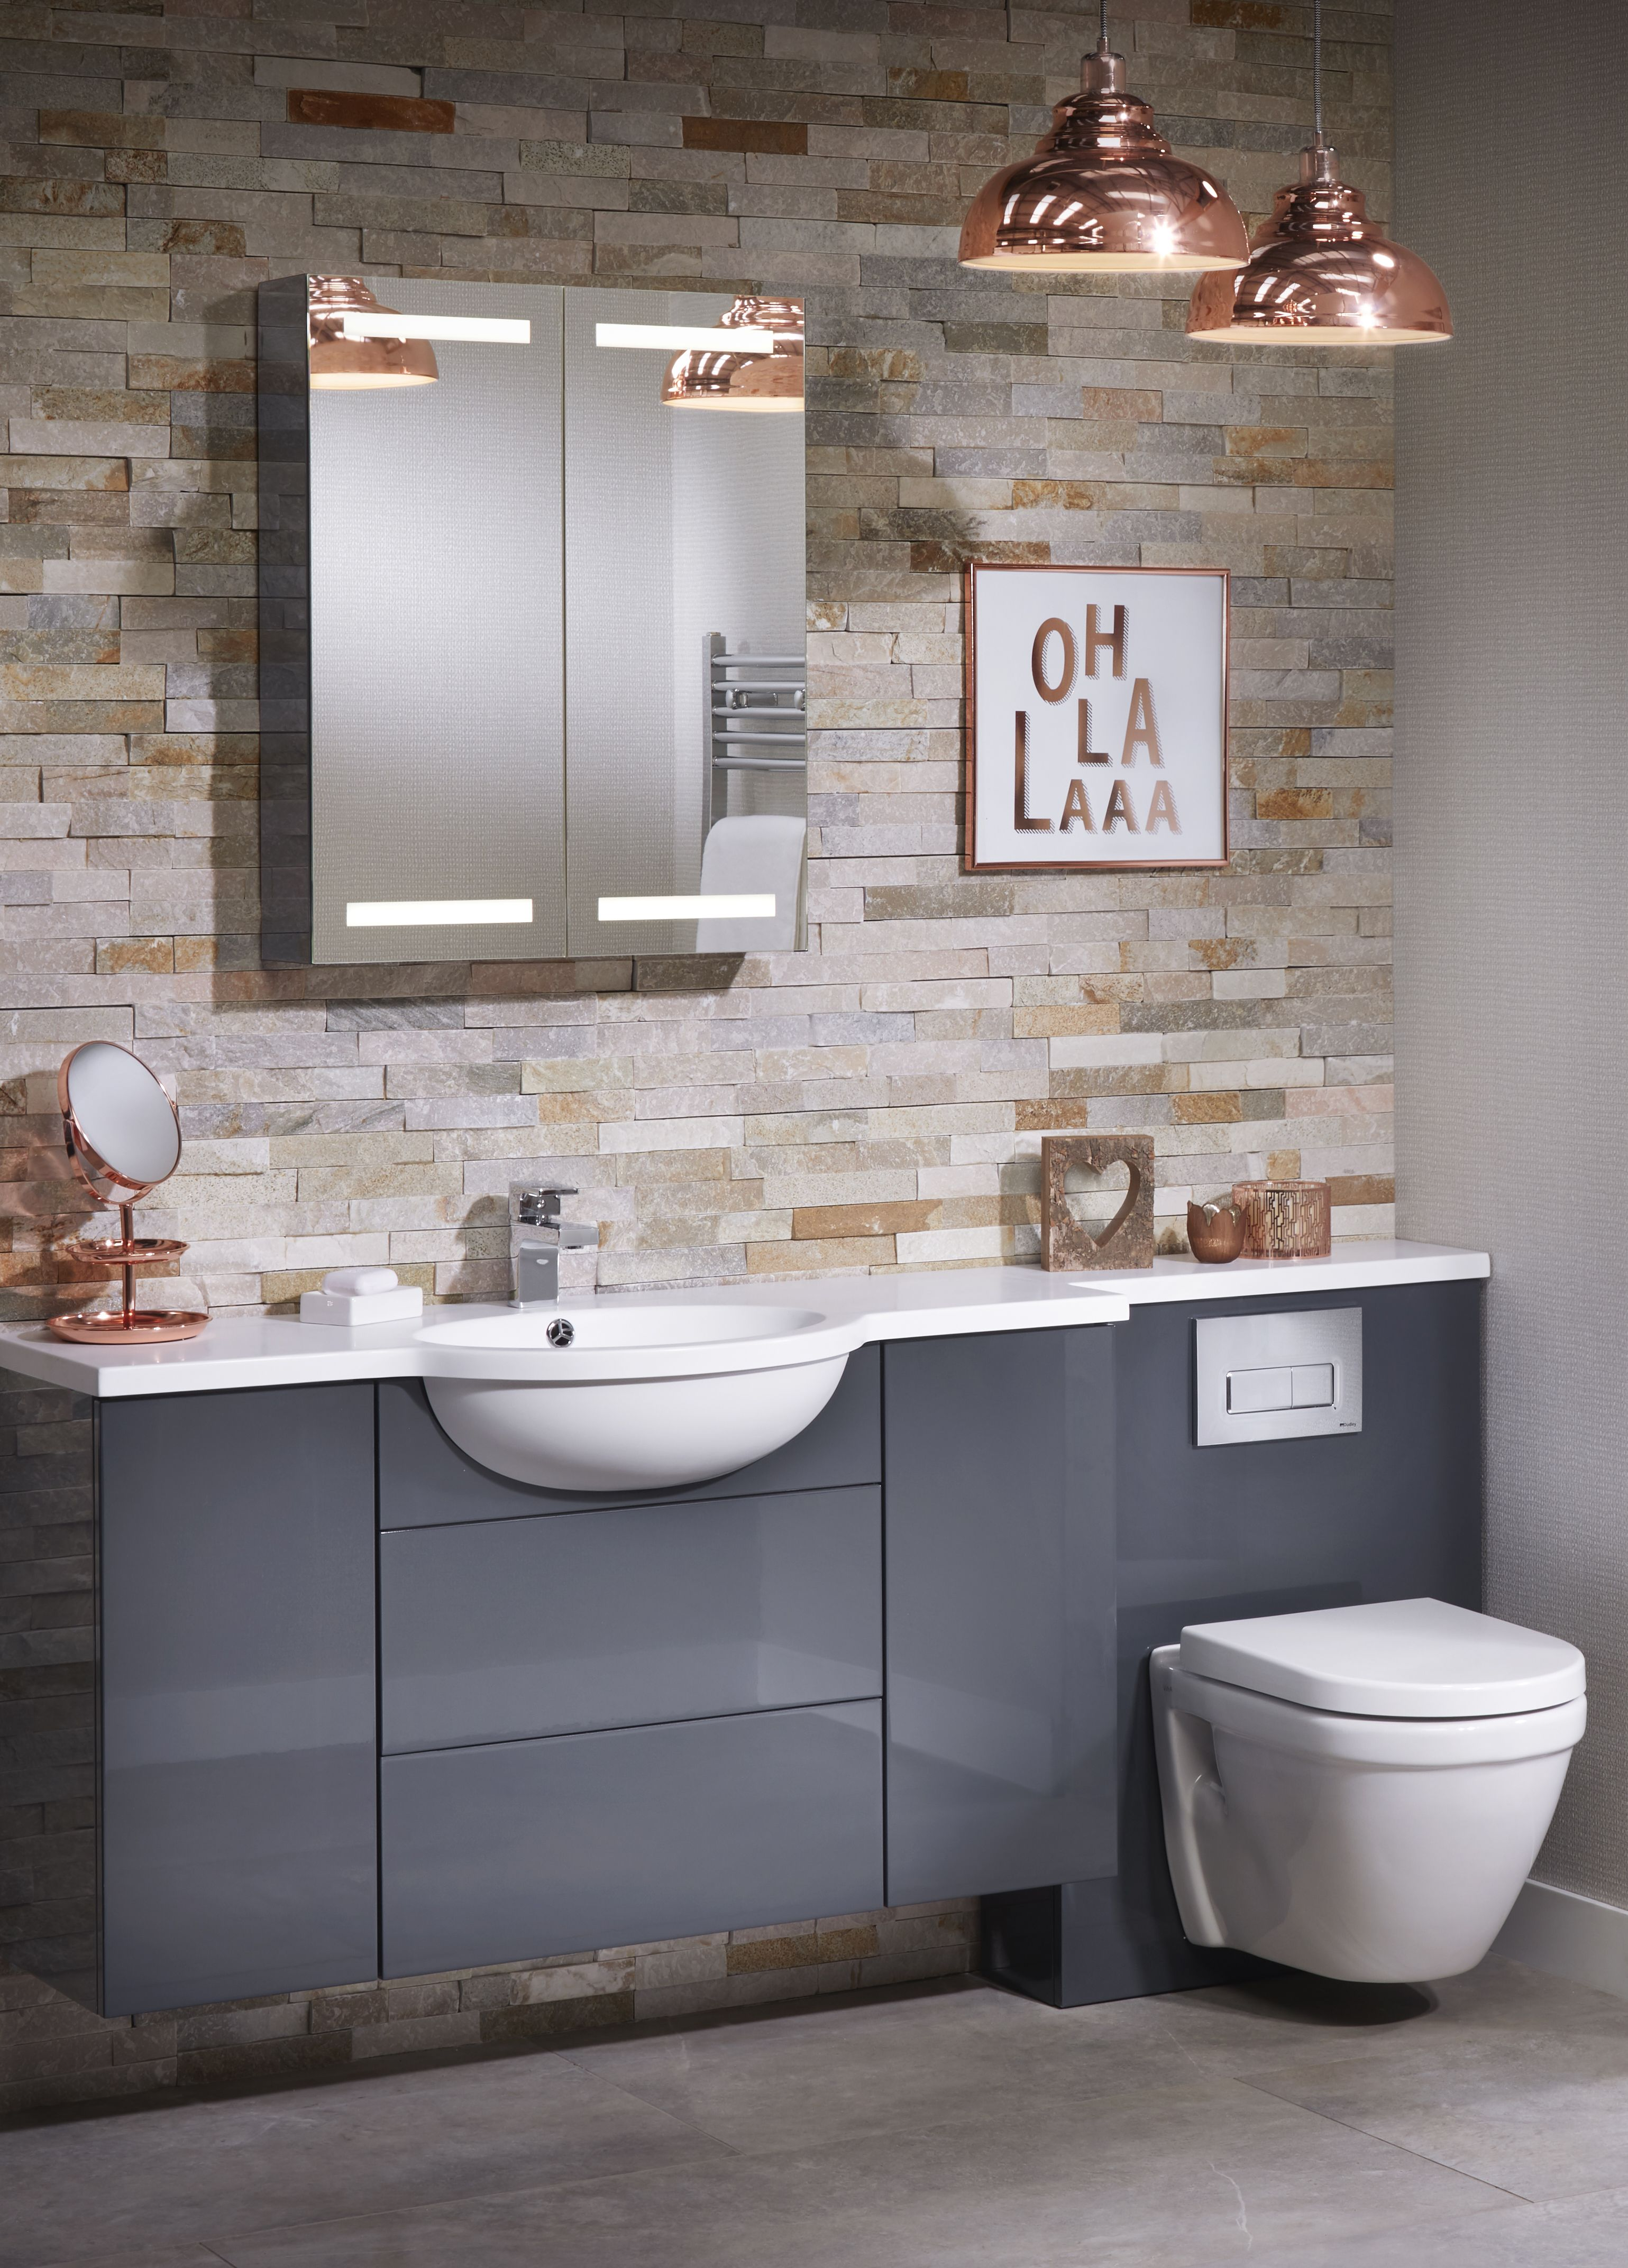 Oh La La indeed! Striking Grey furniture looks sensational with